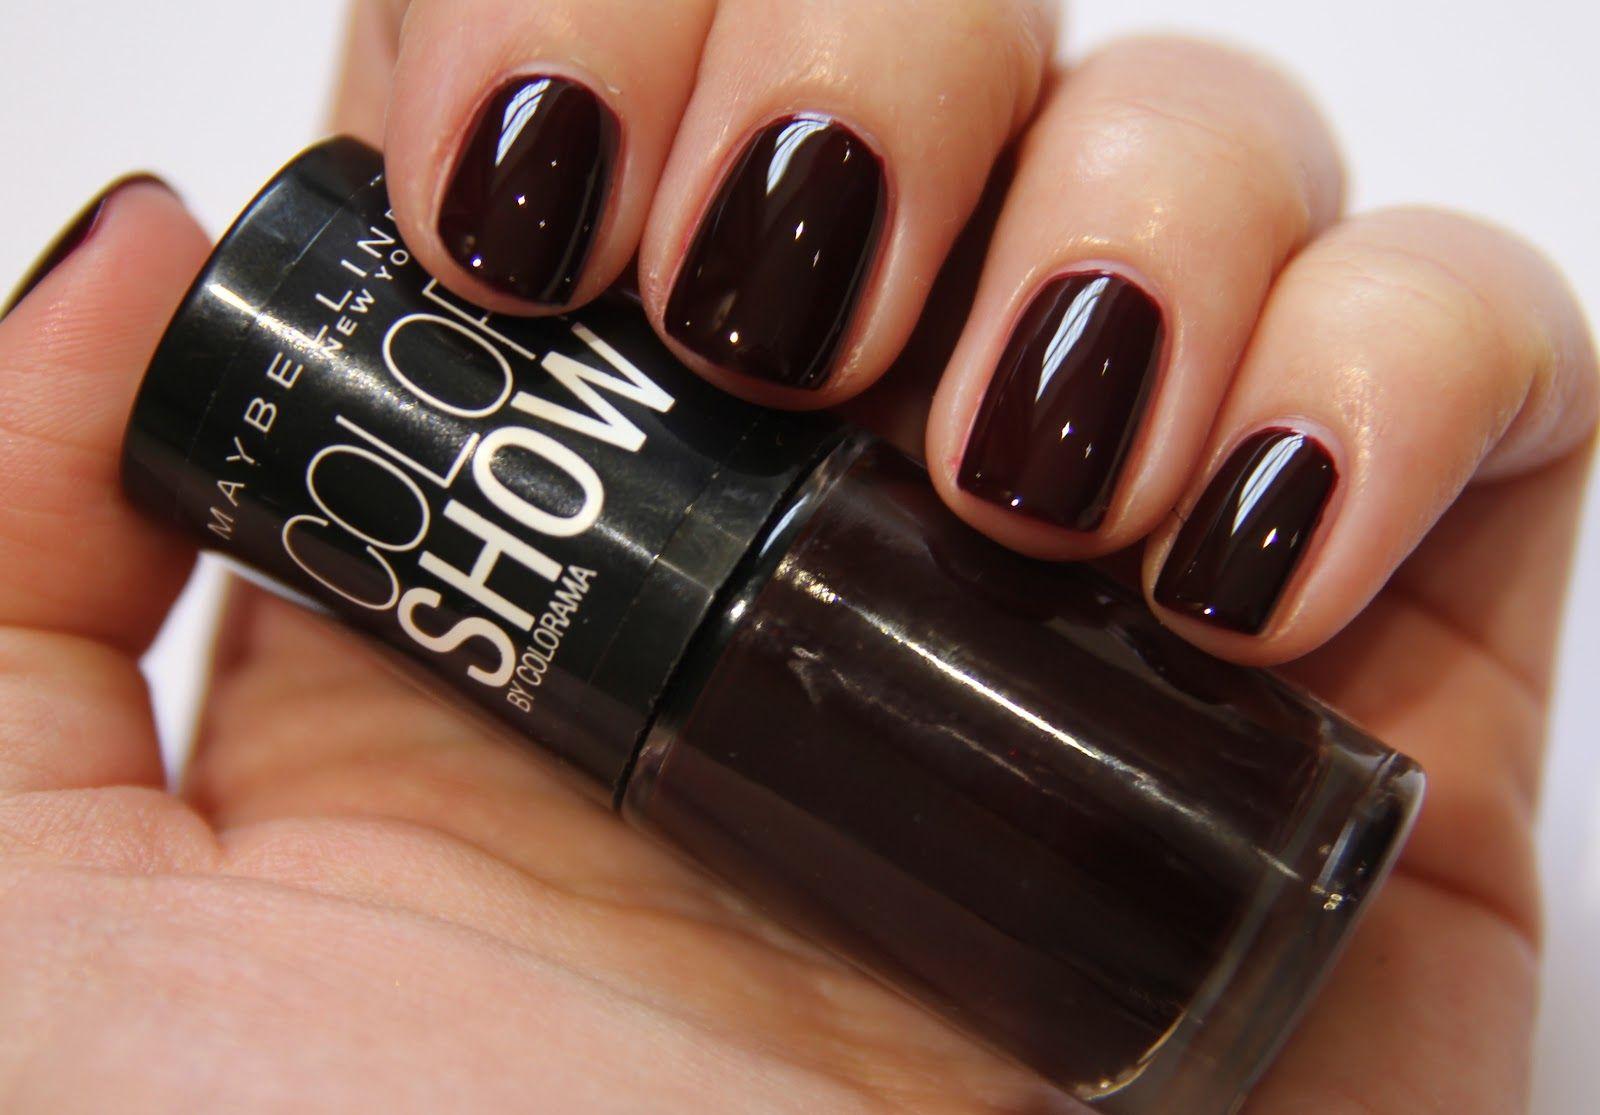 Maybelline Color Show Nailpolish Burgundy Kiss A Beautiful Very Dark Red Nail Polish Almost